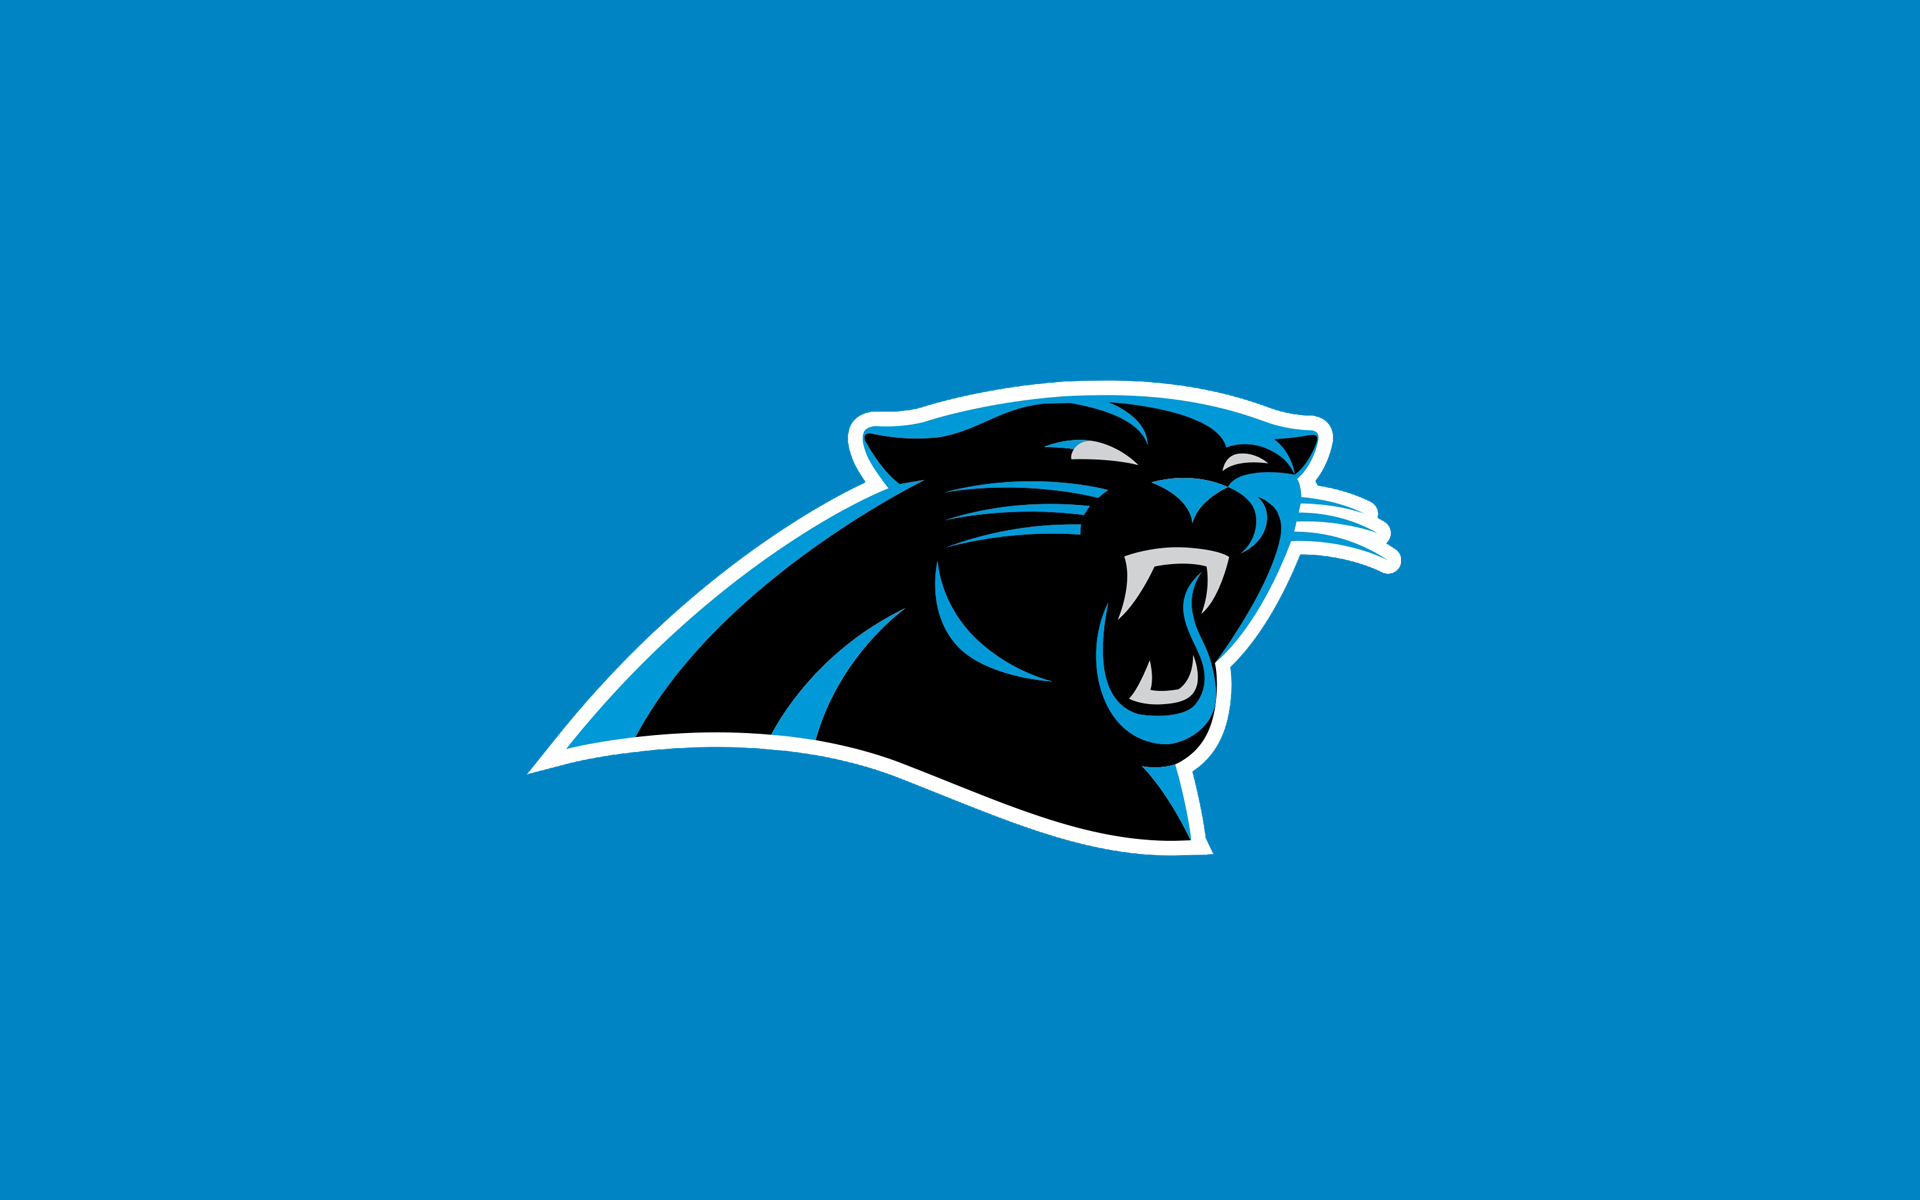 Travel Agency Wallpaper Hd Carolina Panthers Logo Wallpaper Hd Pixelstalk Net